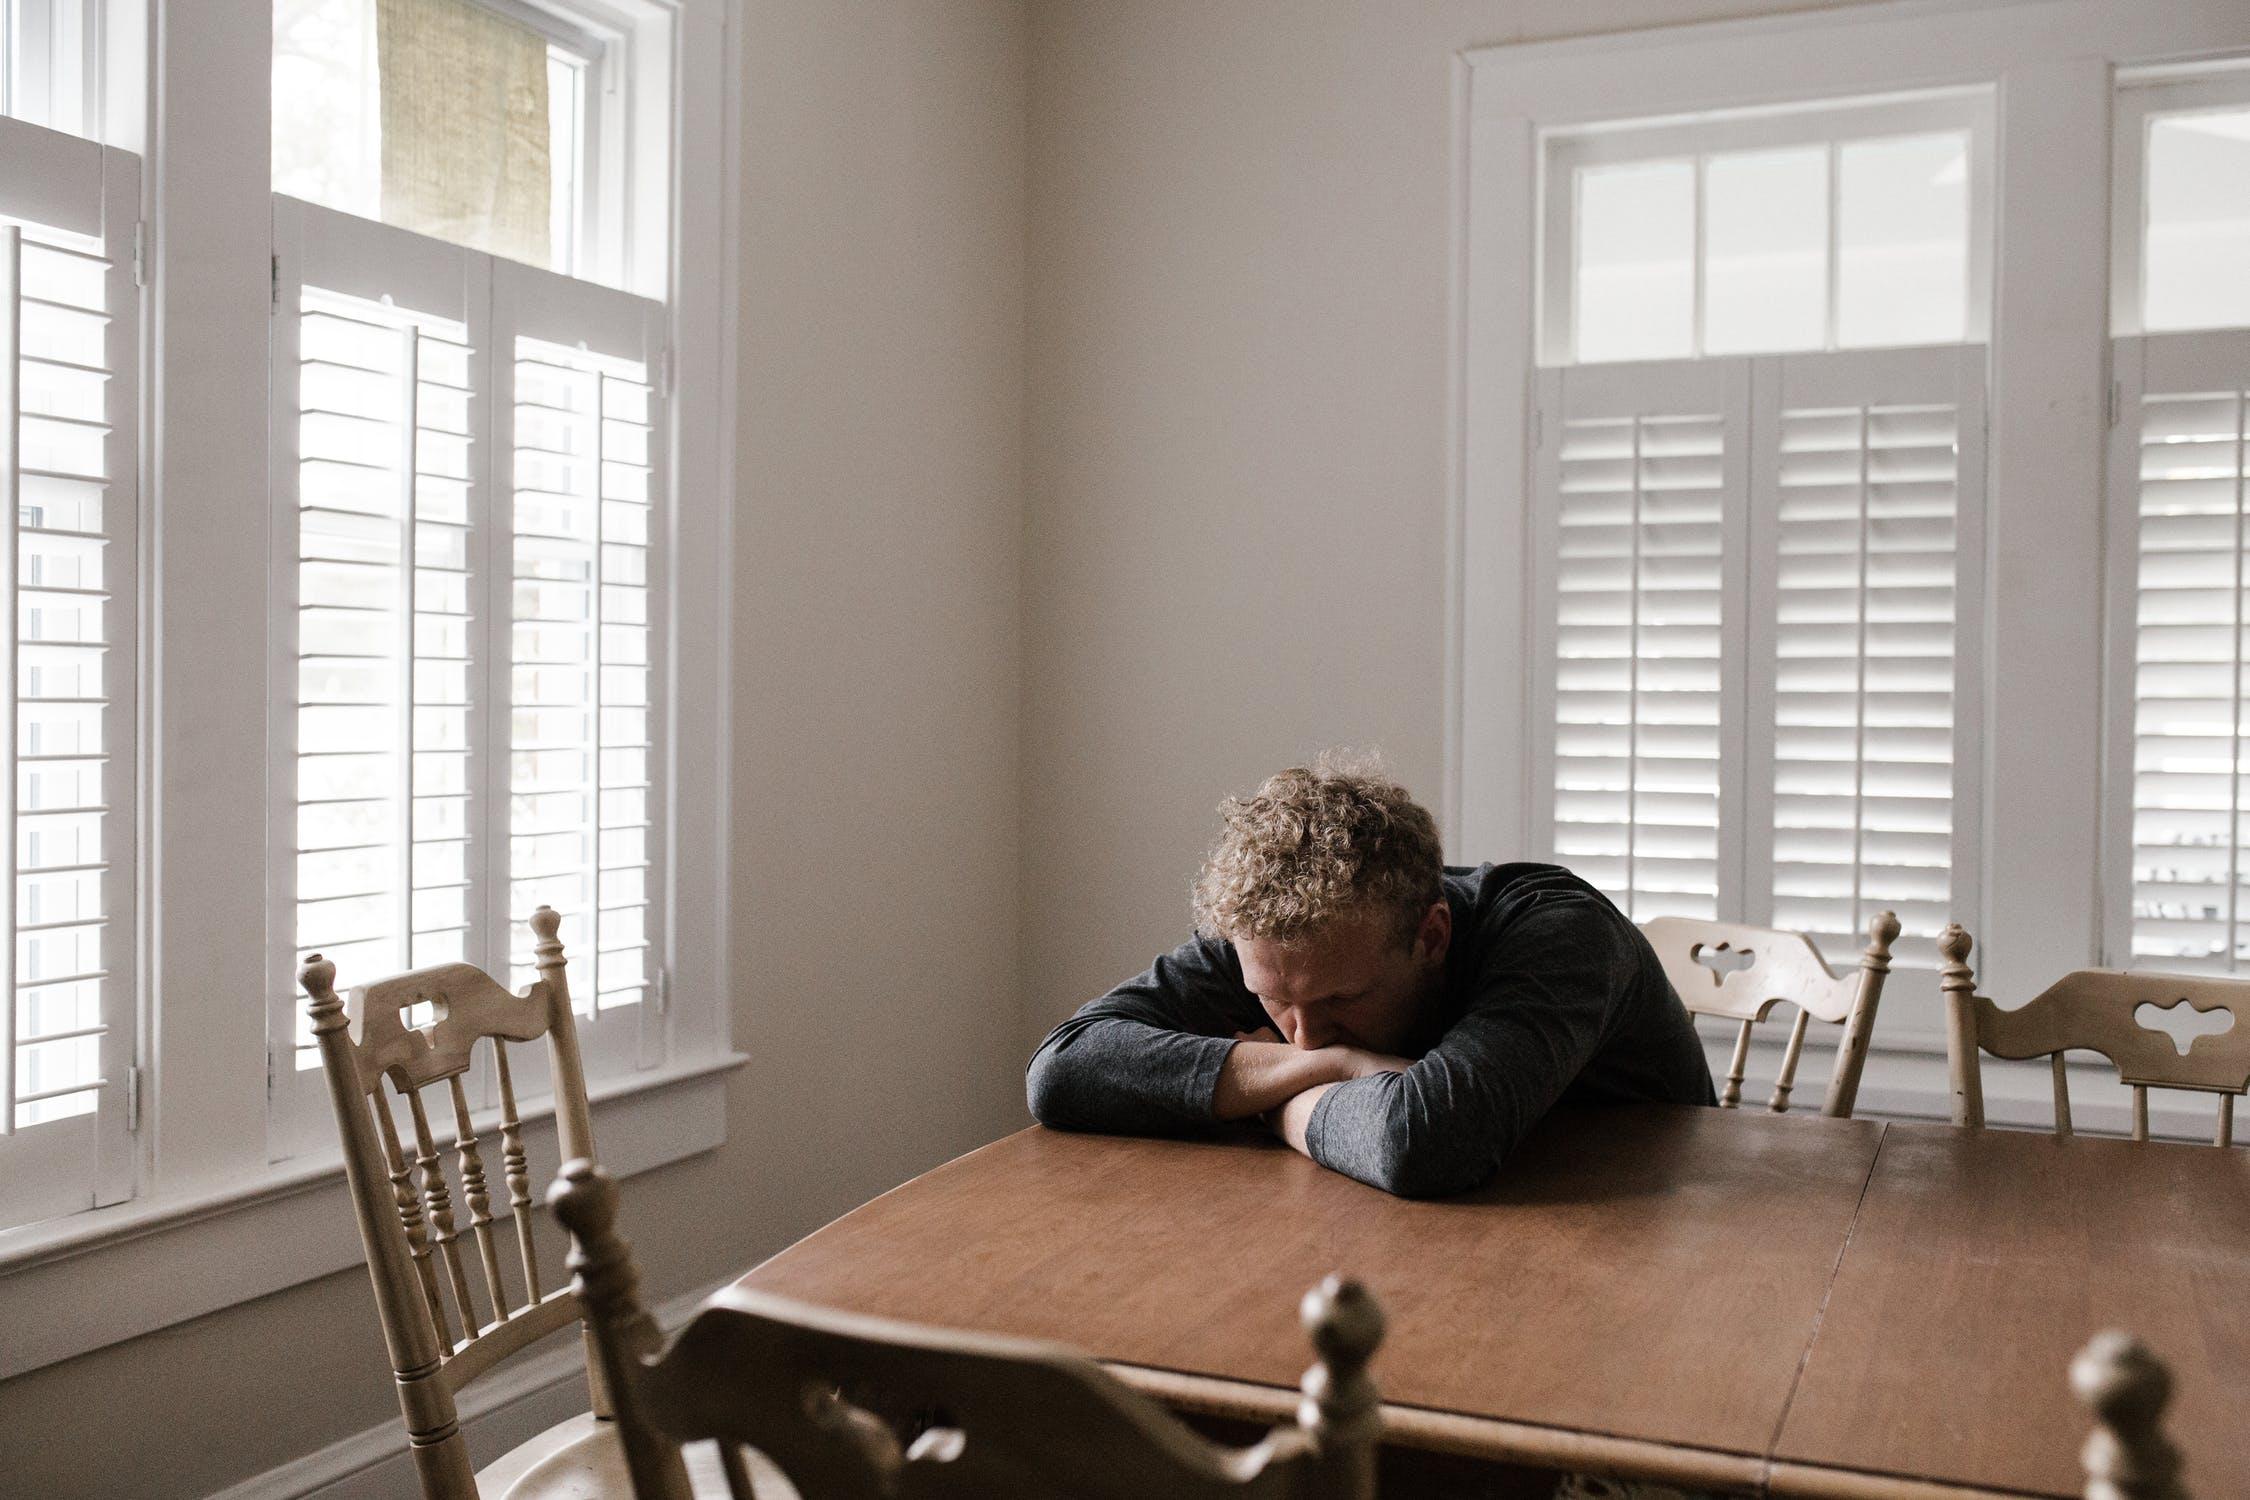 Unhappy man sitting at table